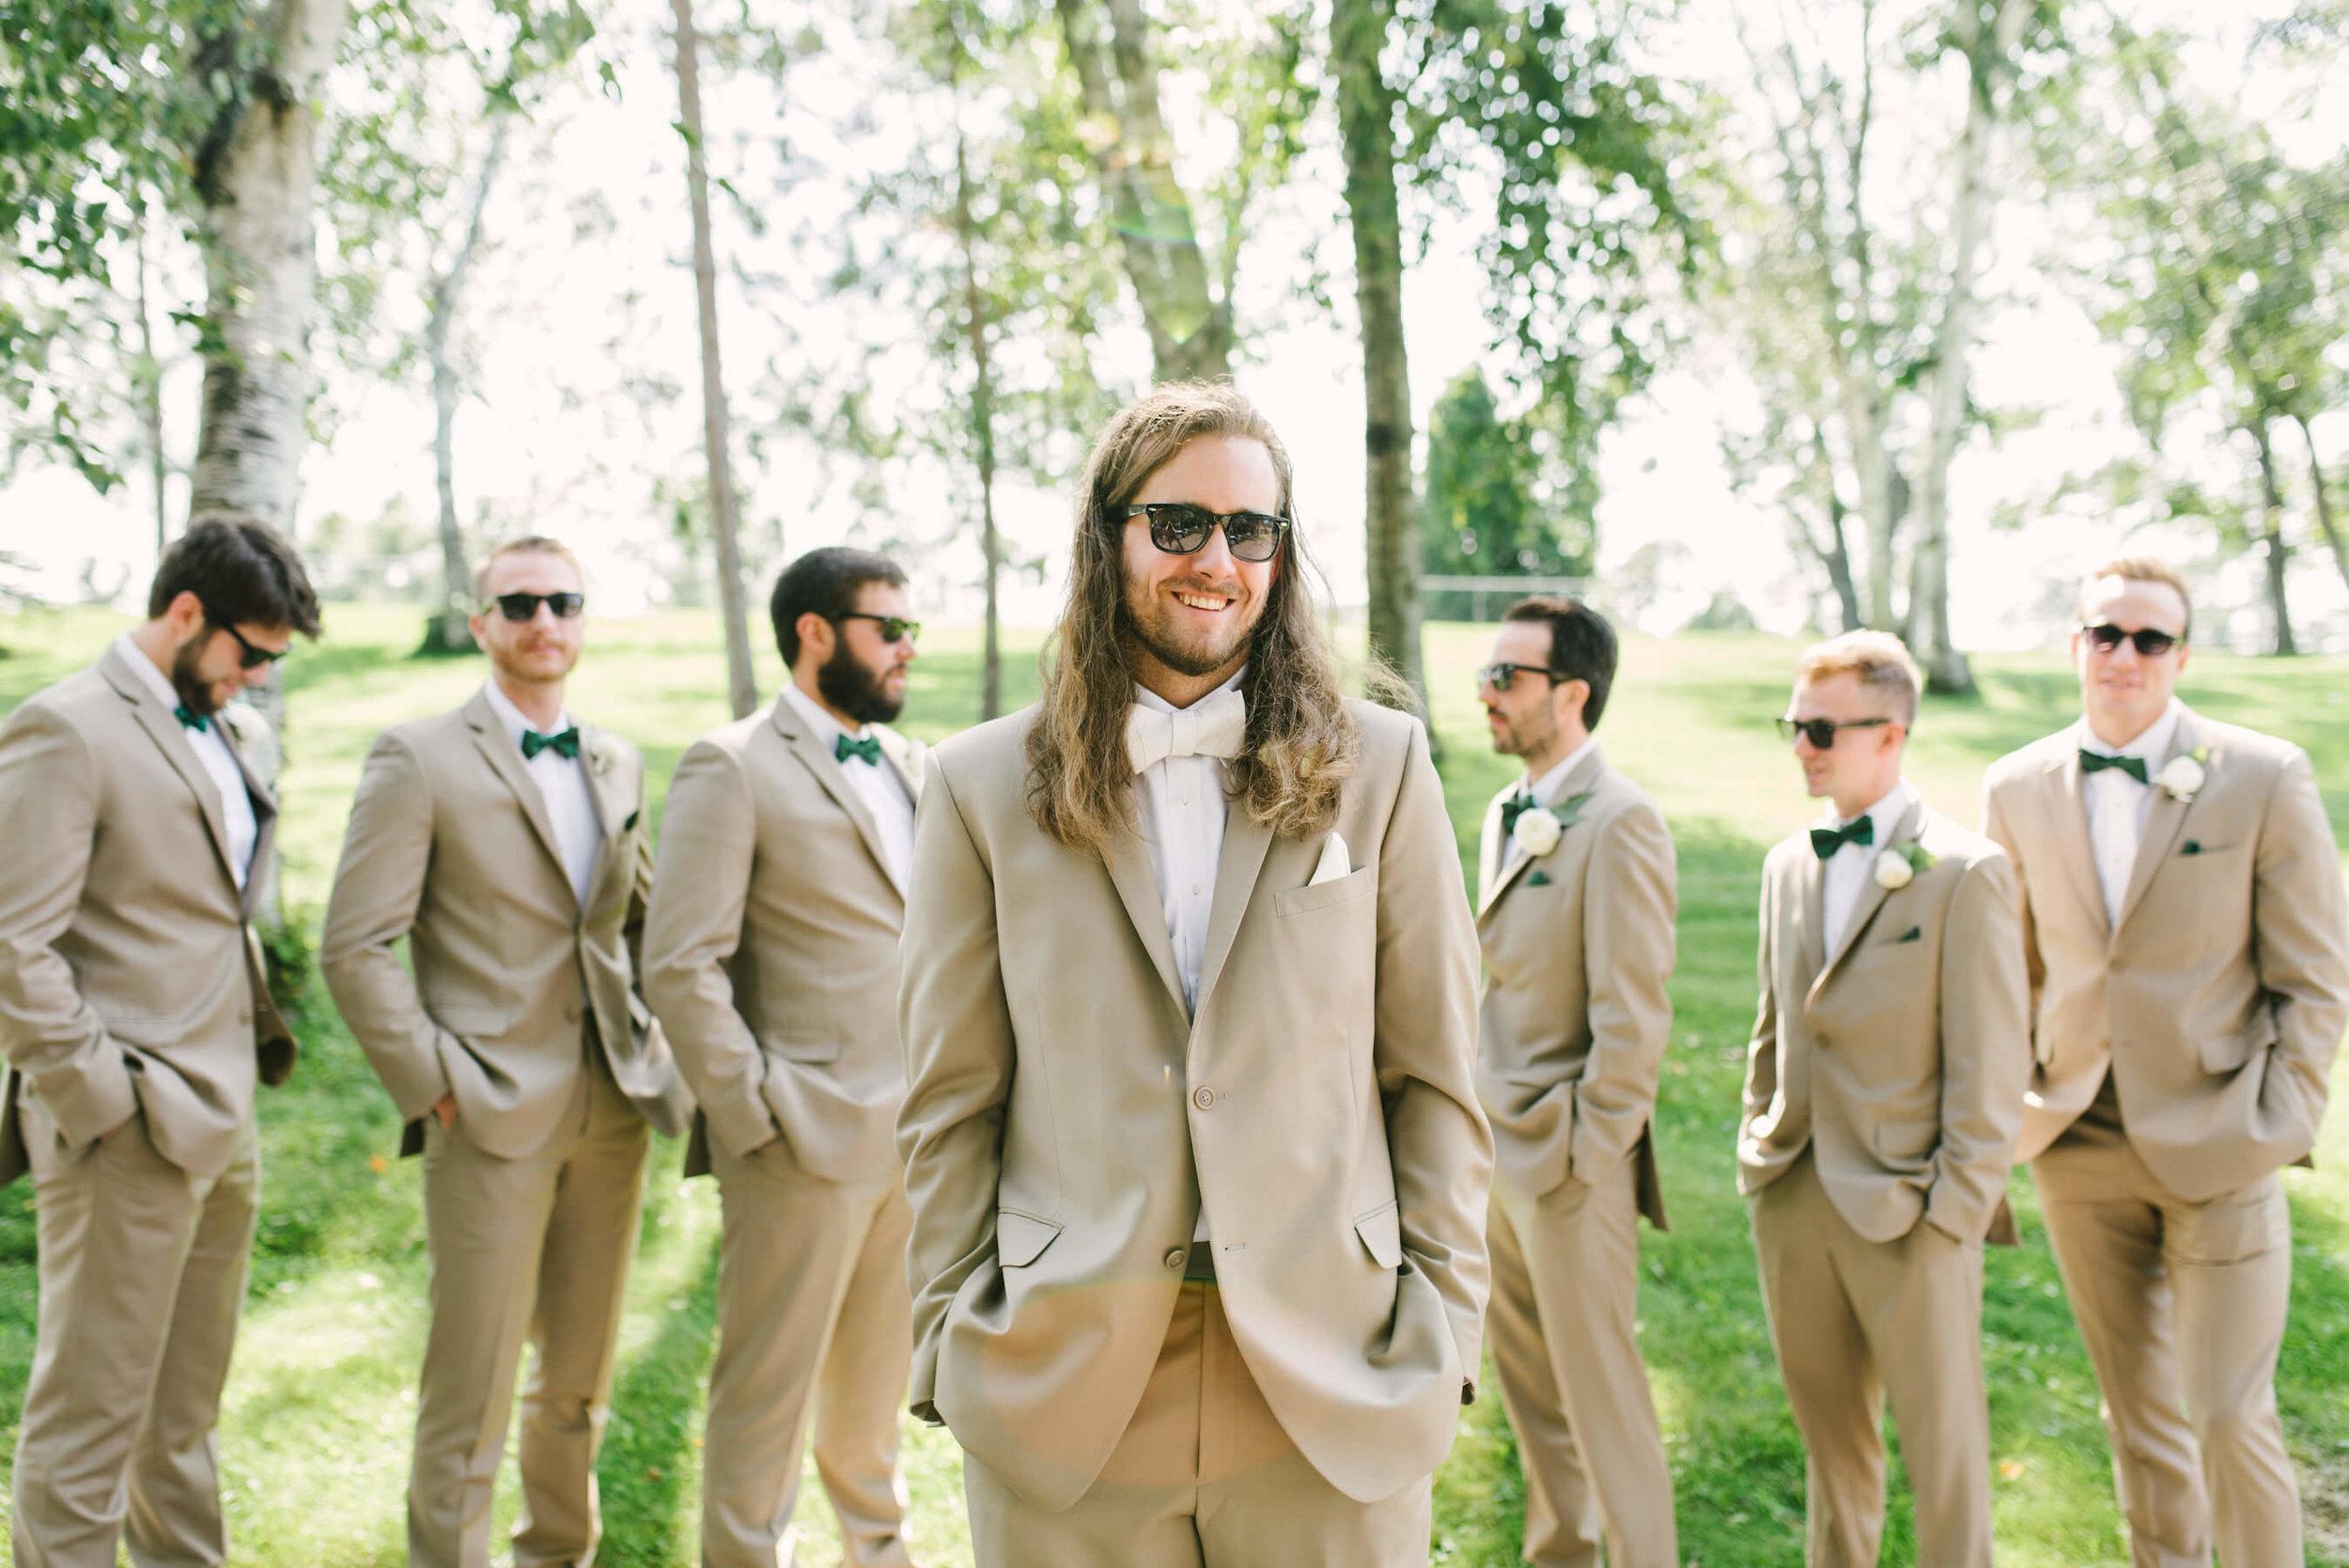 engle-olson-wedding-blair-taylor-17.jpg